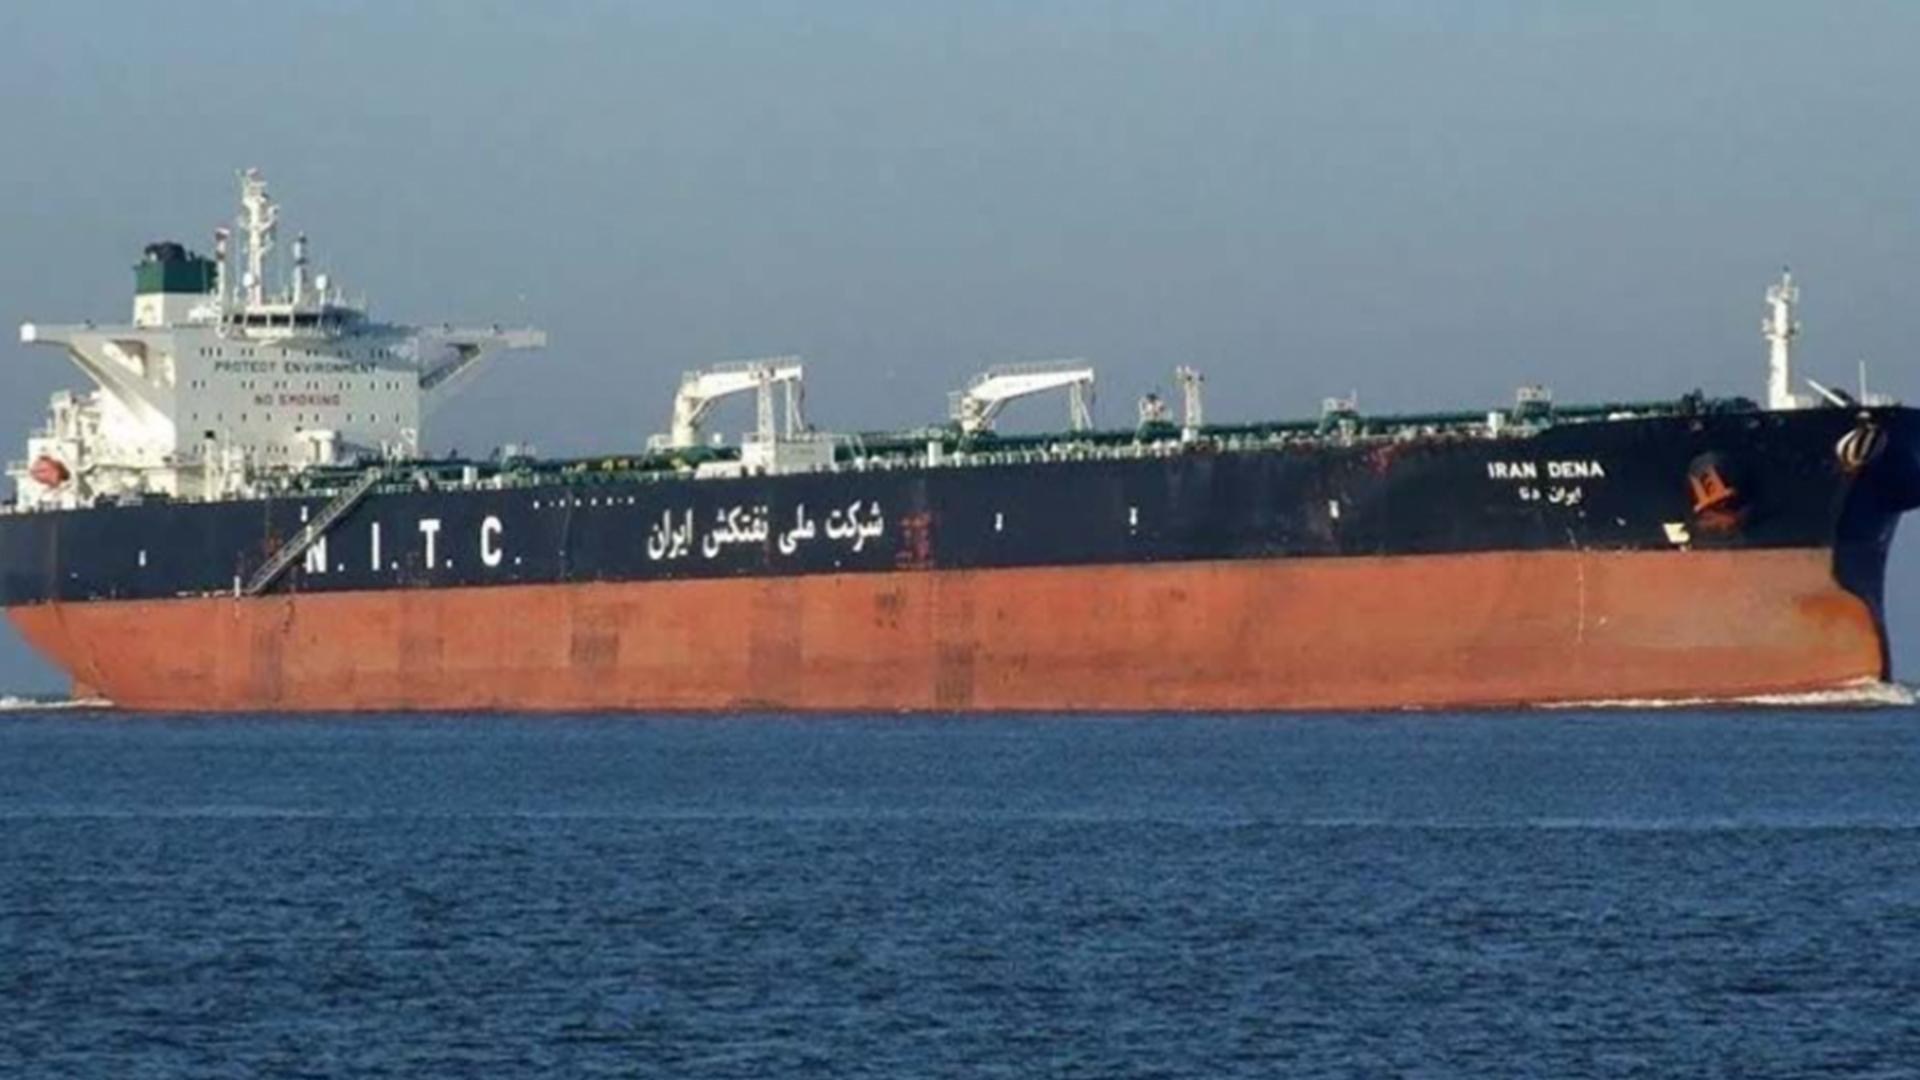 Segundo tanquero iraní con gasolina, se acerca a la Isla de Margarita